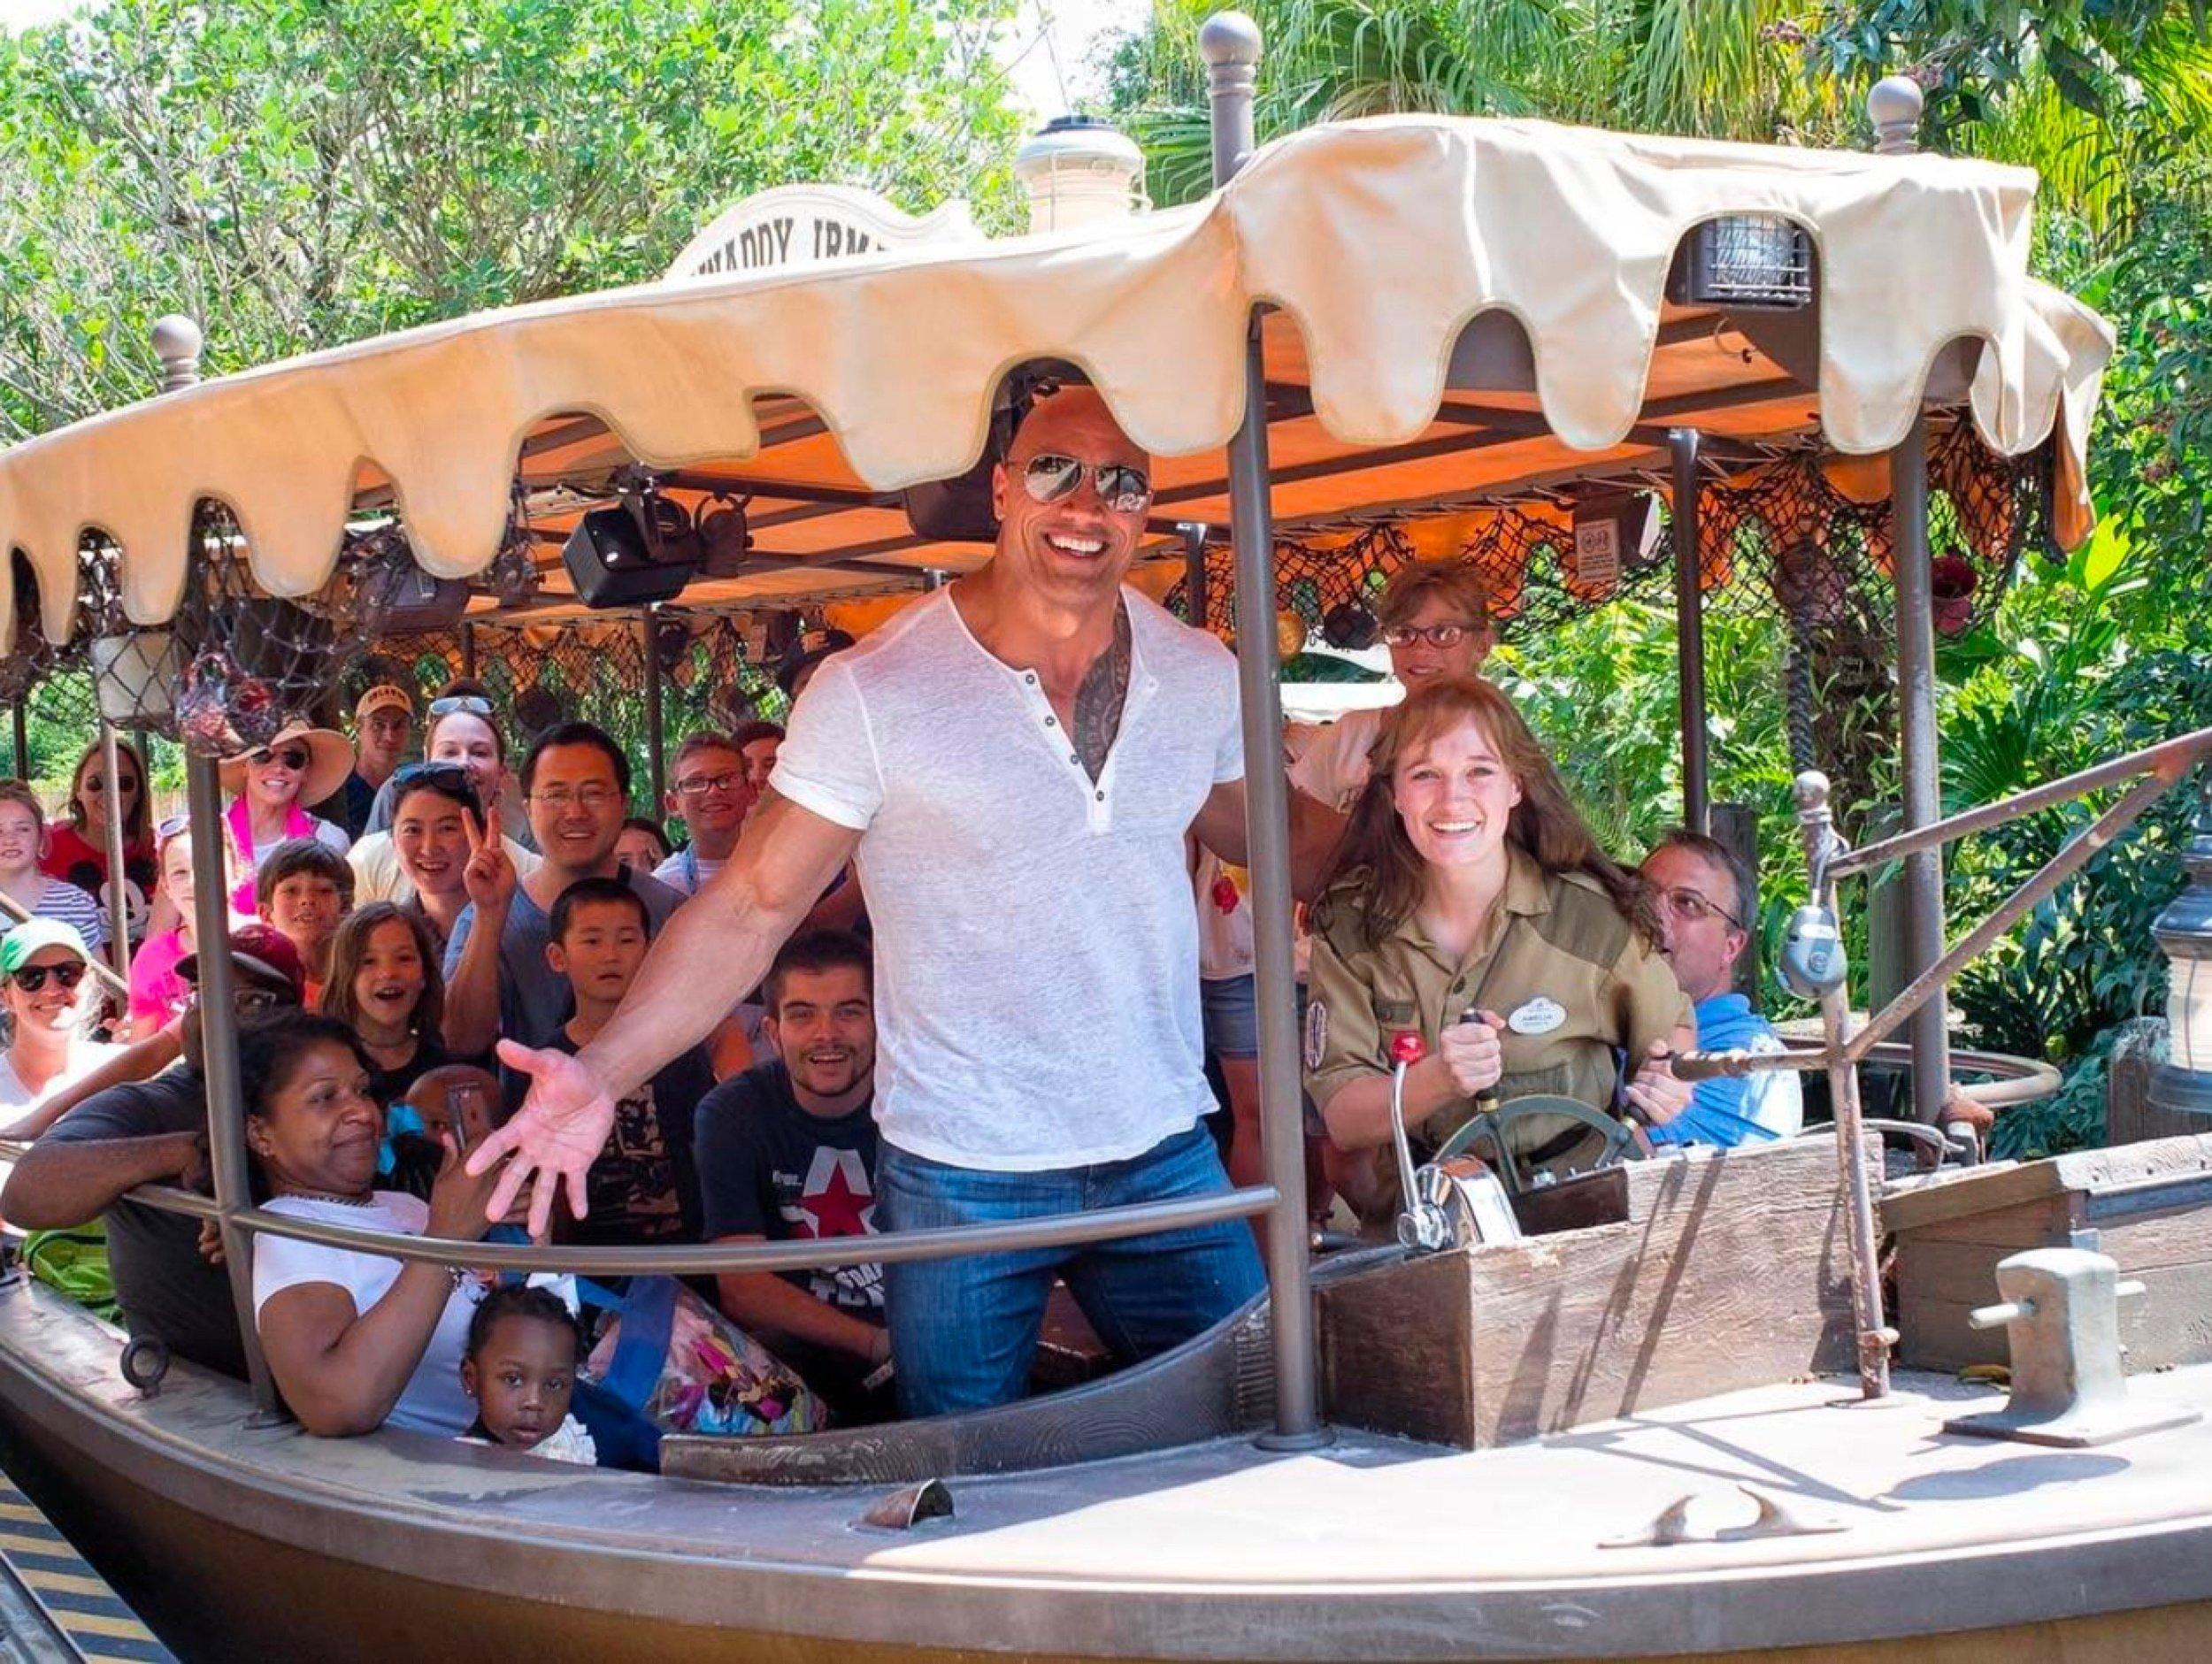 Disneyland + the Rock = Better! -